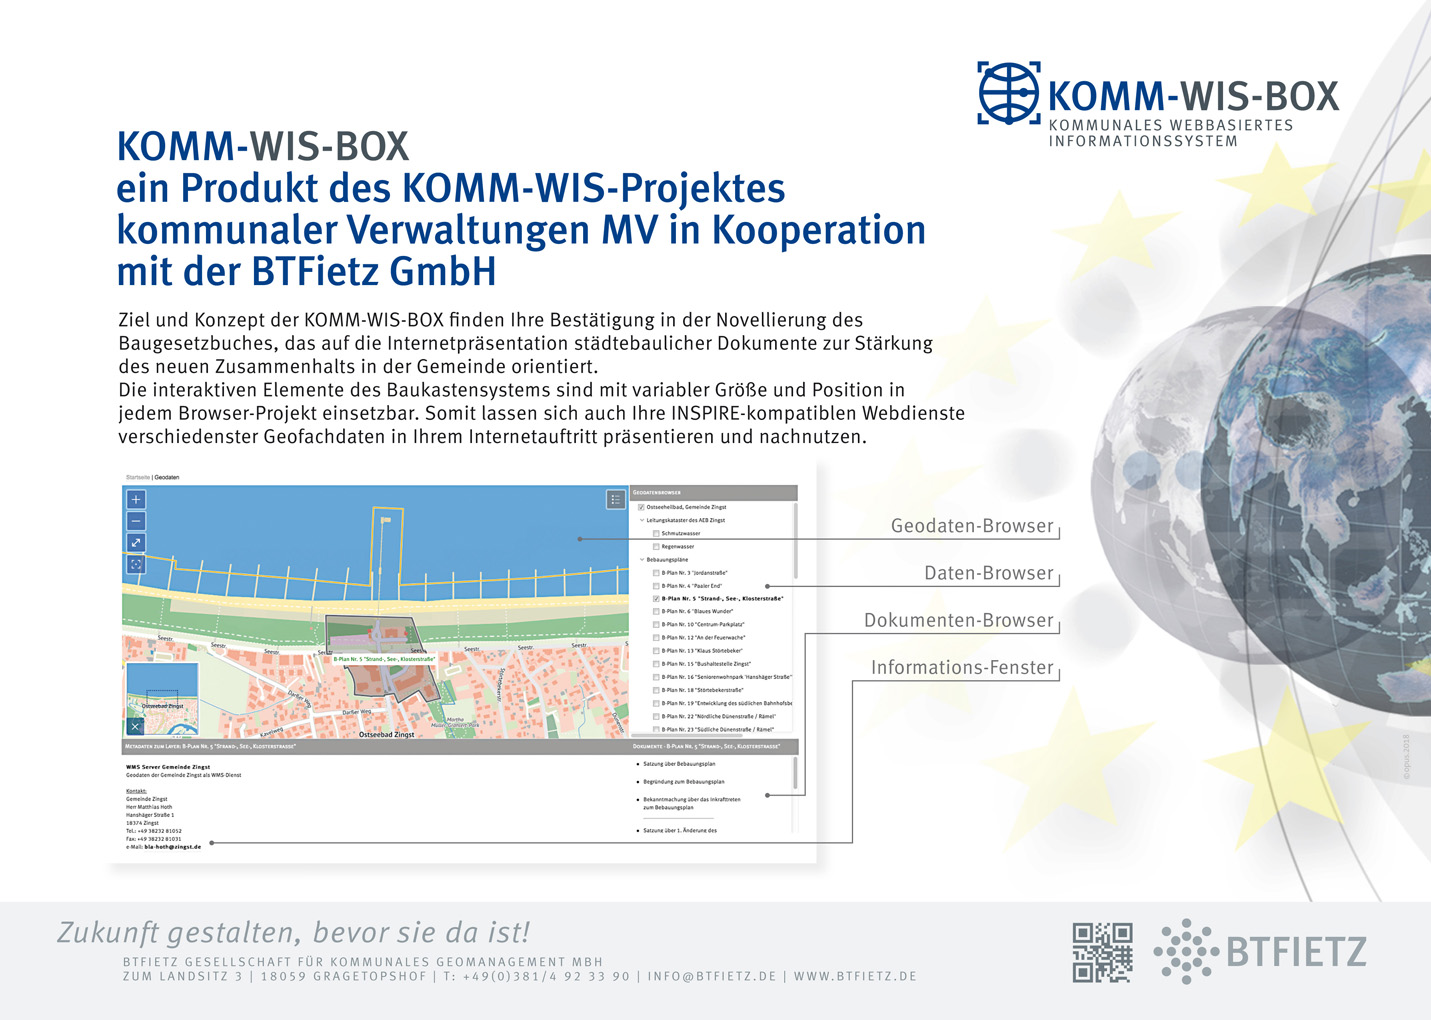 PB_KOMM-WIS-BOX_P_www_kl.jpg